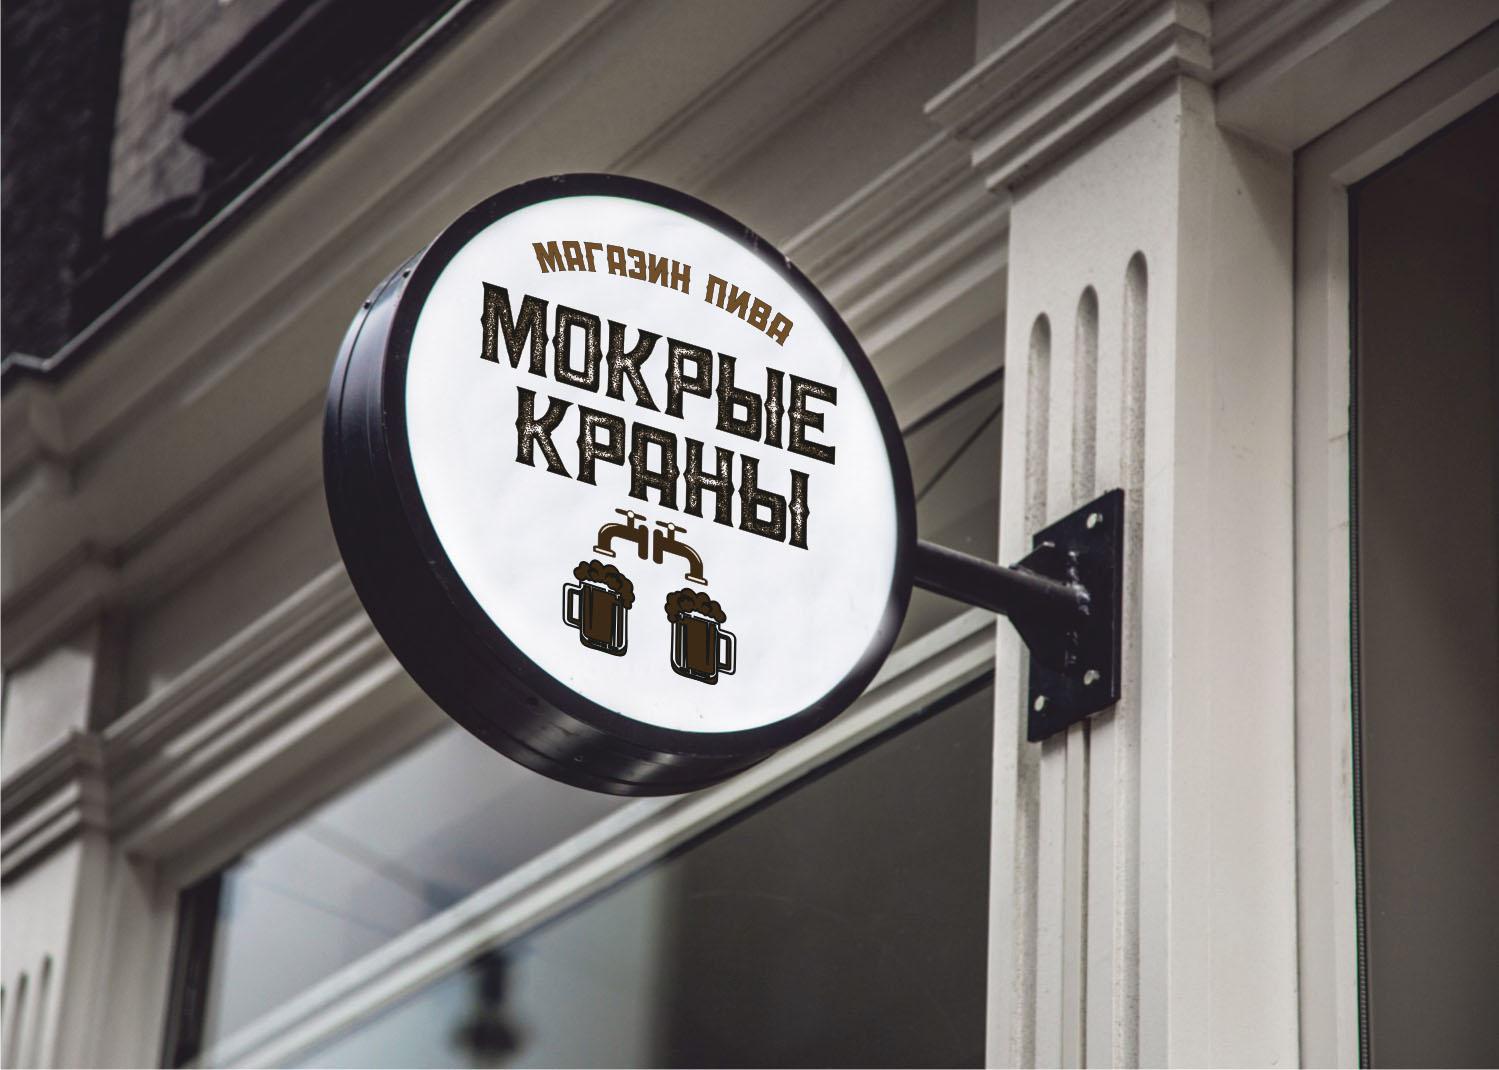 Вывеска/логотип для пивного магазина фото f_953602100fdb1e36.jpg